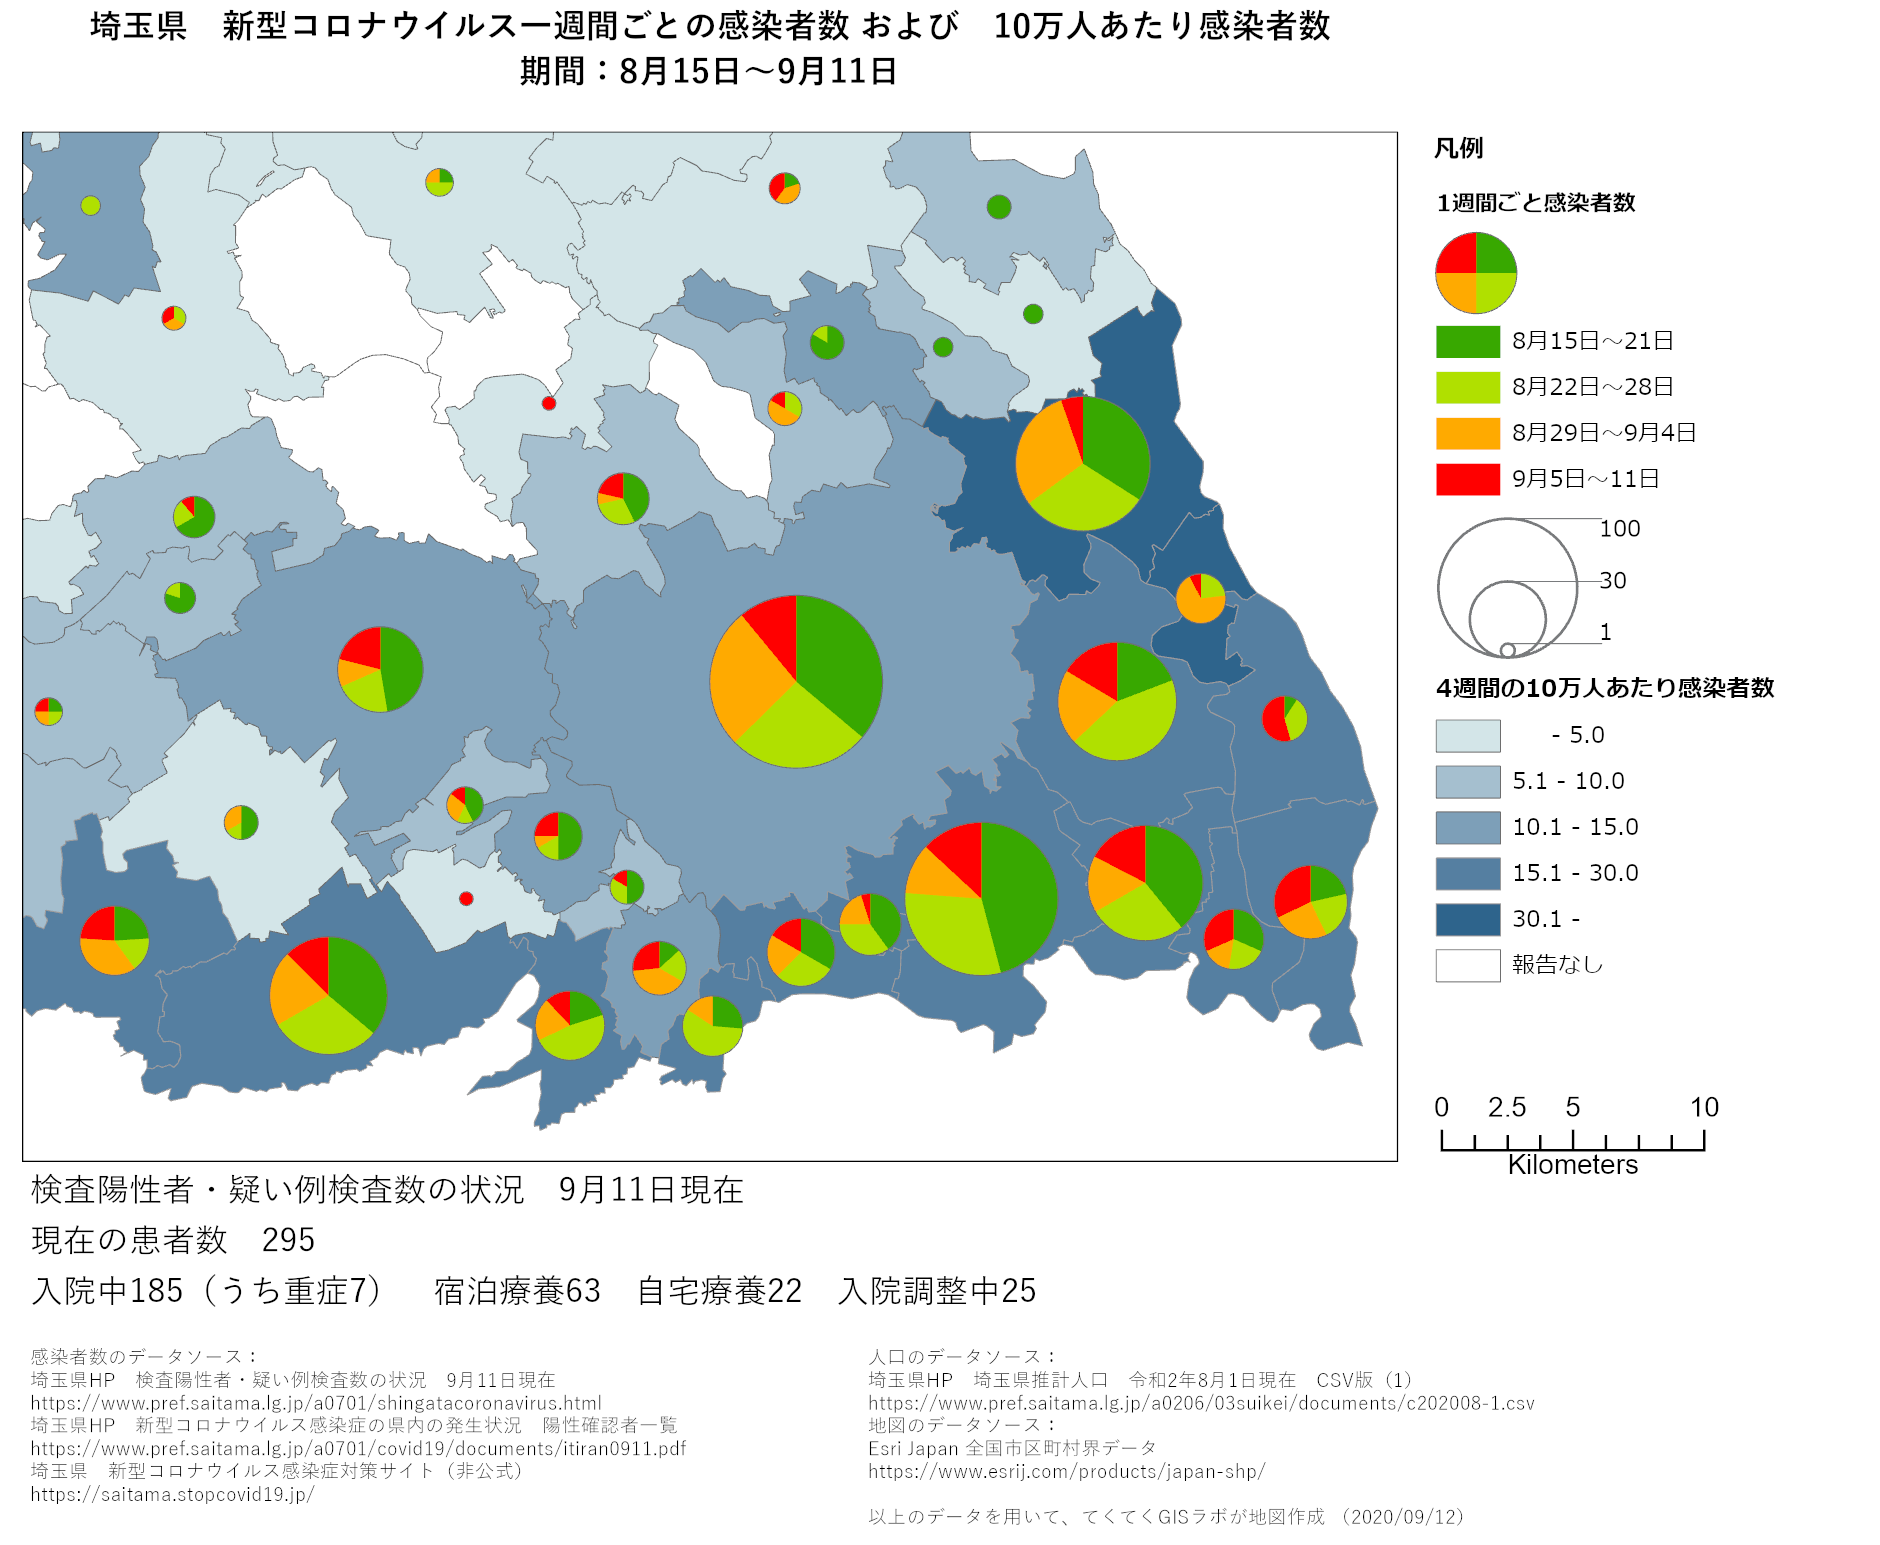 1週間ごと感染者数、埼玉県、8月15日〜9月11日